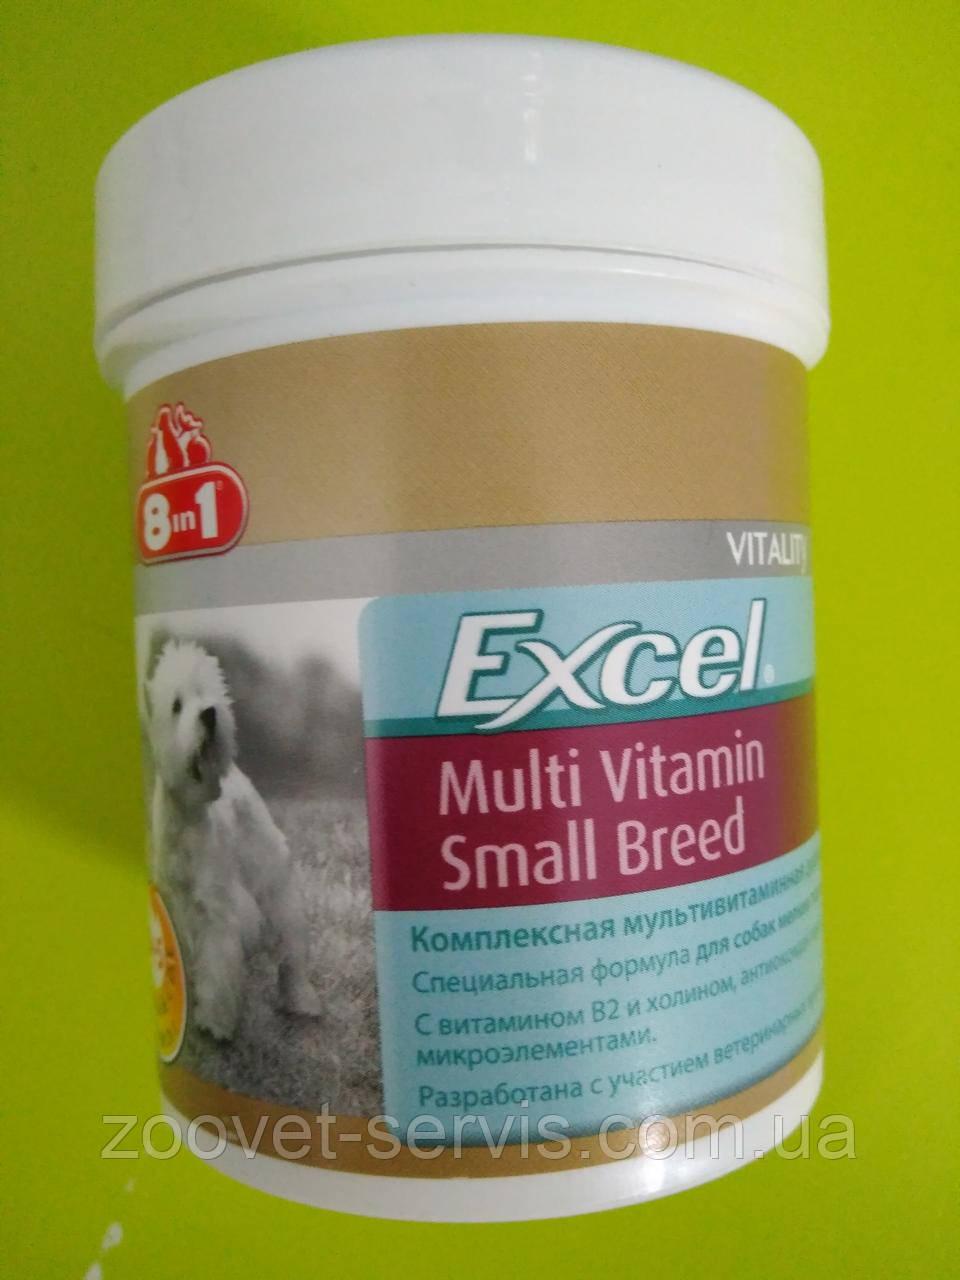 Мультивитаминный комплексExcel Multi Vitamin Small Breed 8in1 для собак мелких пород